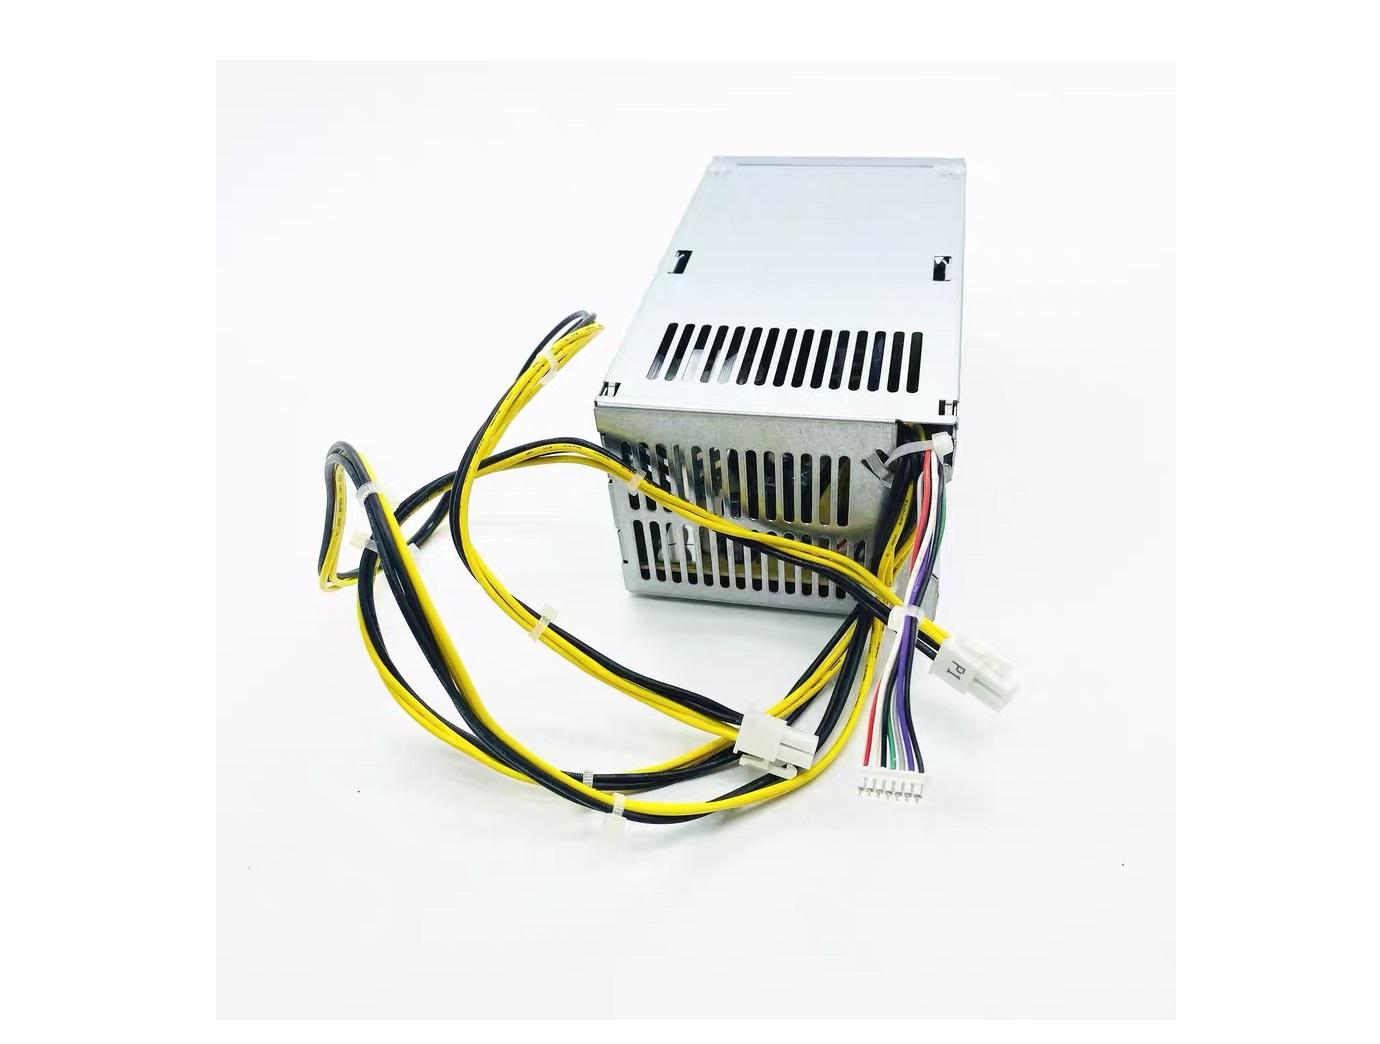 L08261-002 180W Power Supply D16-180P1B For HP Pavillion 590 - 365PowerSupply.com - Dell Power Supply | HP Power Supply | Lenovo/IBM Power Supply